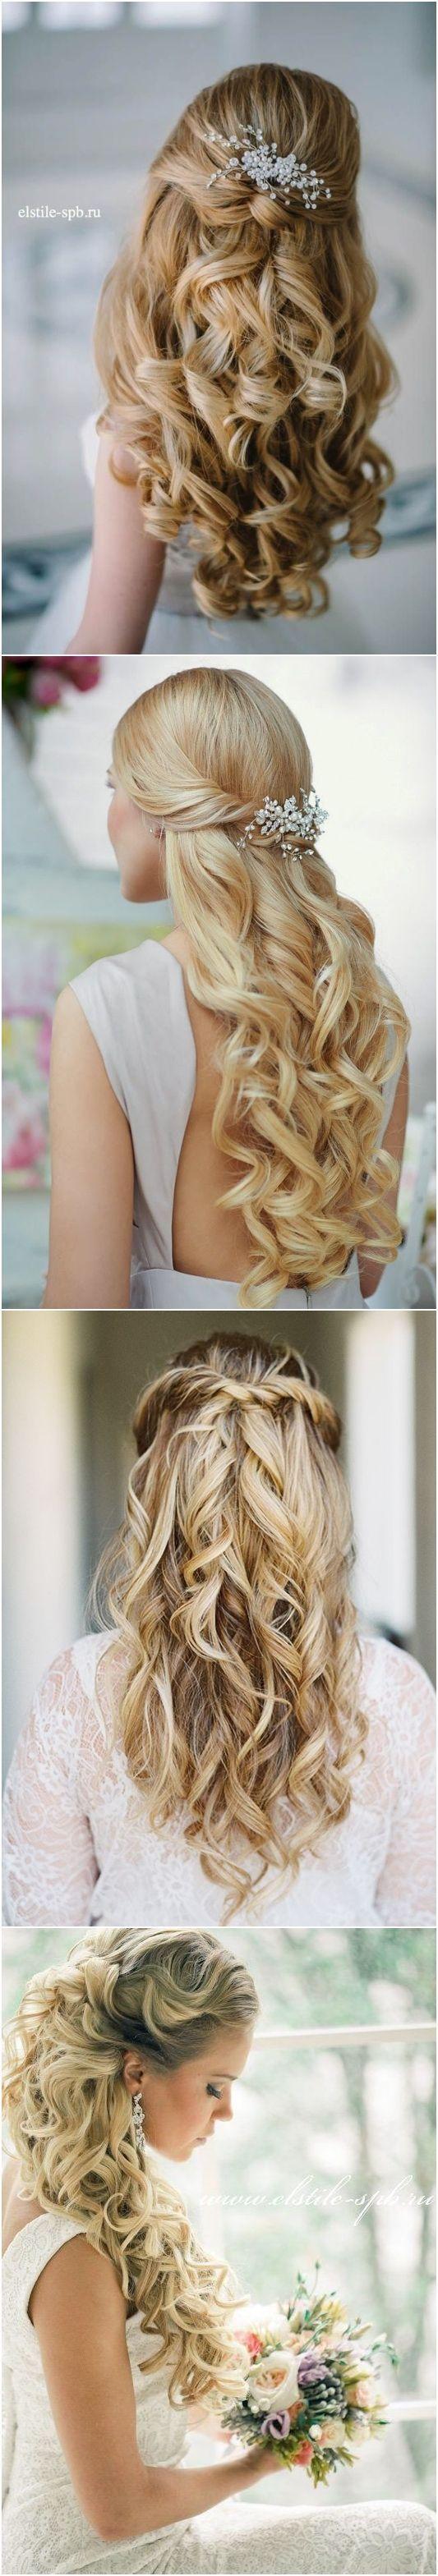 best wedding stuff images on pinterest bridal hairstyles